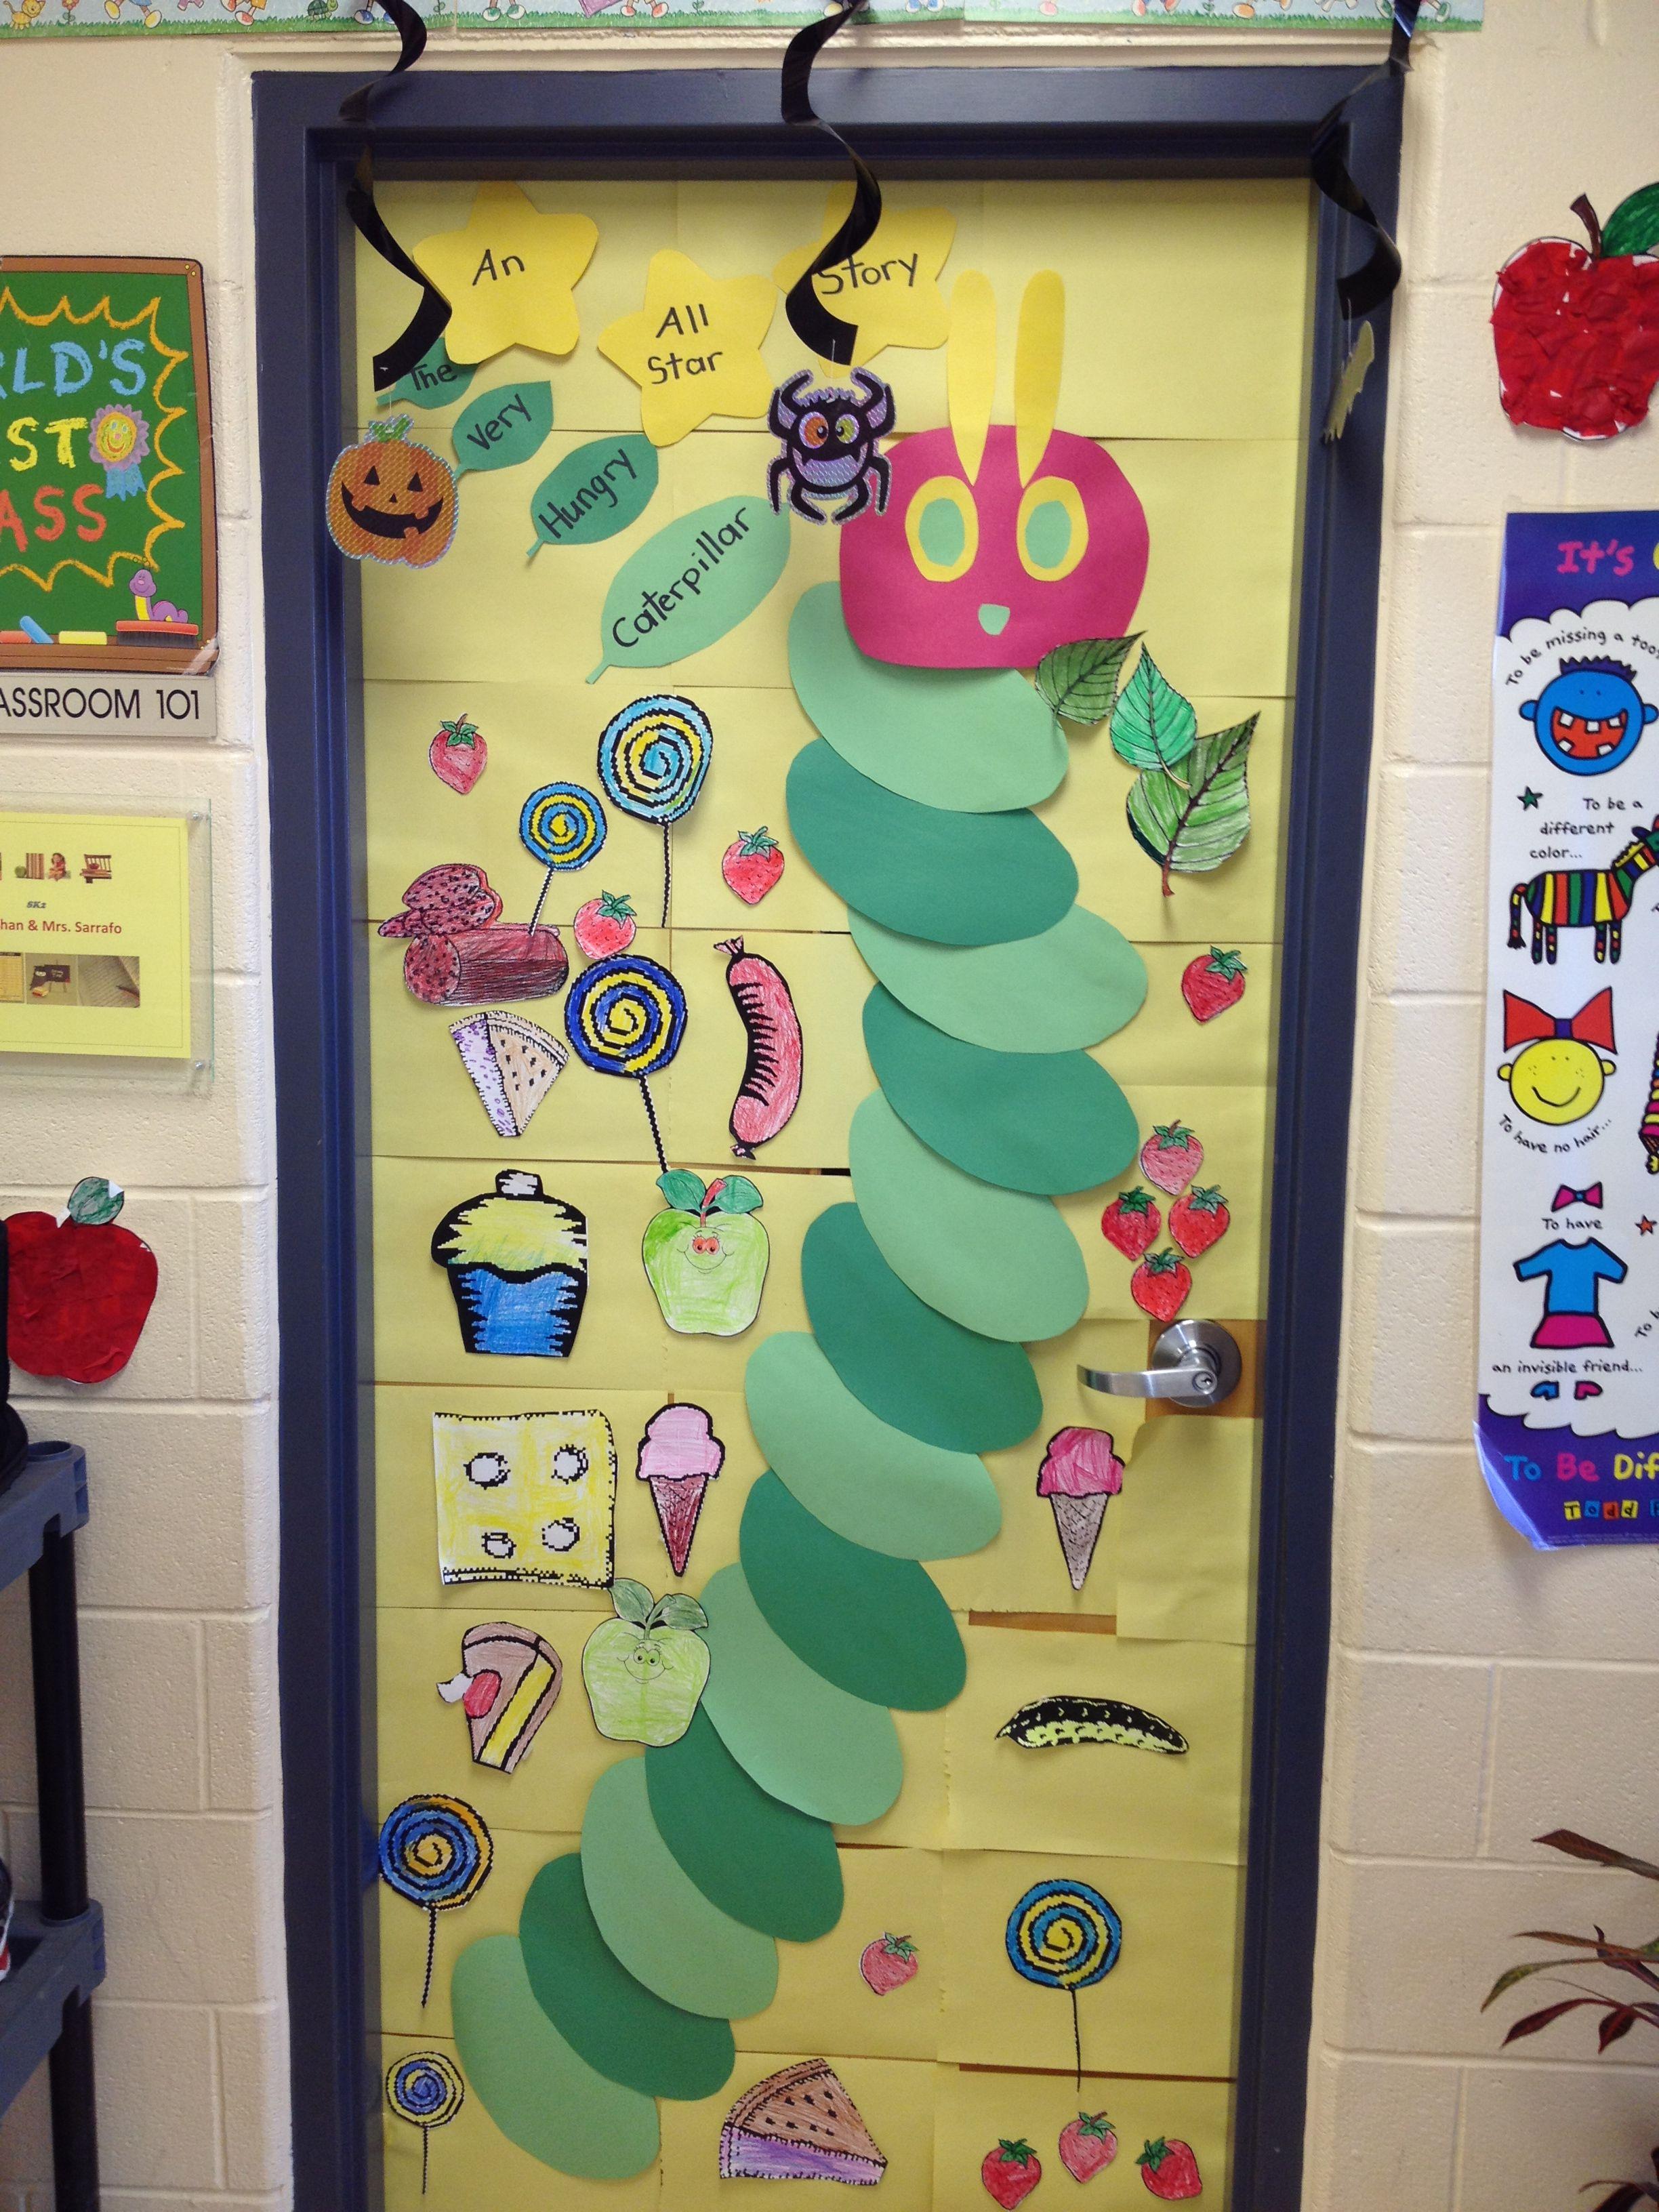 The Very Hungry Caterpillar Classroom Door D